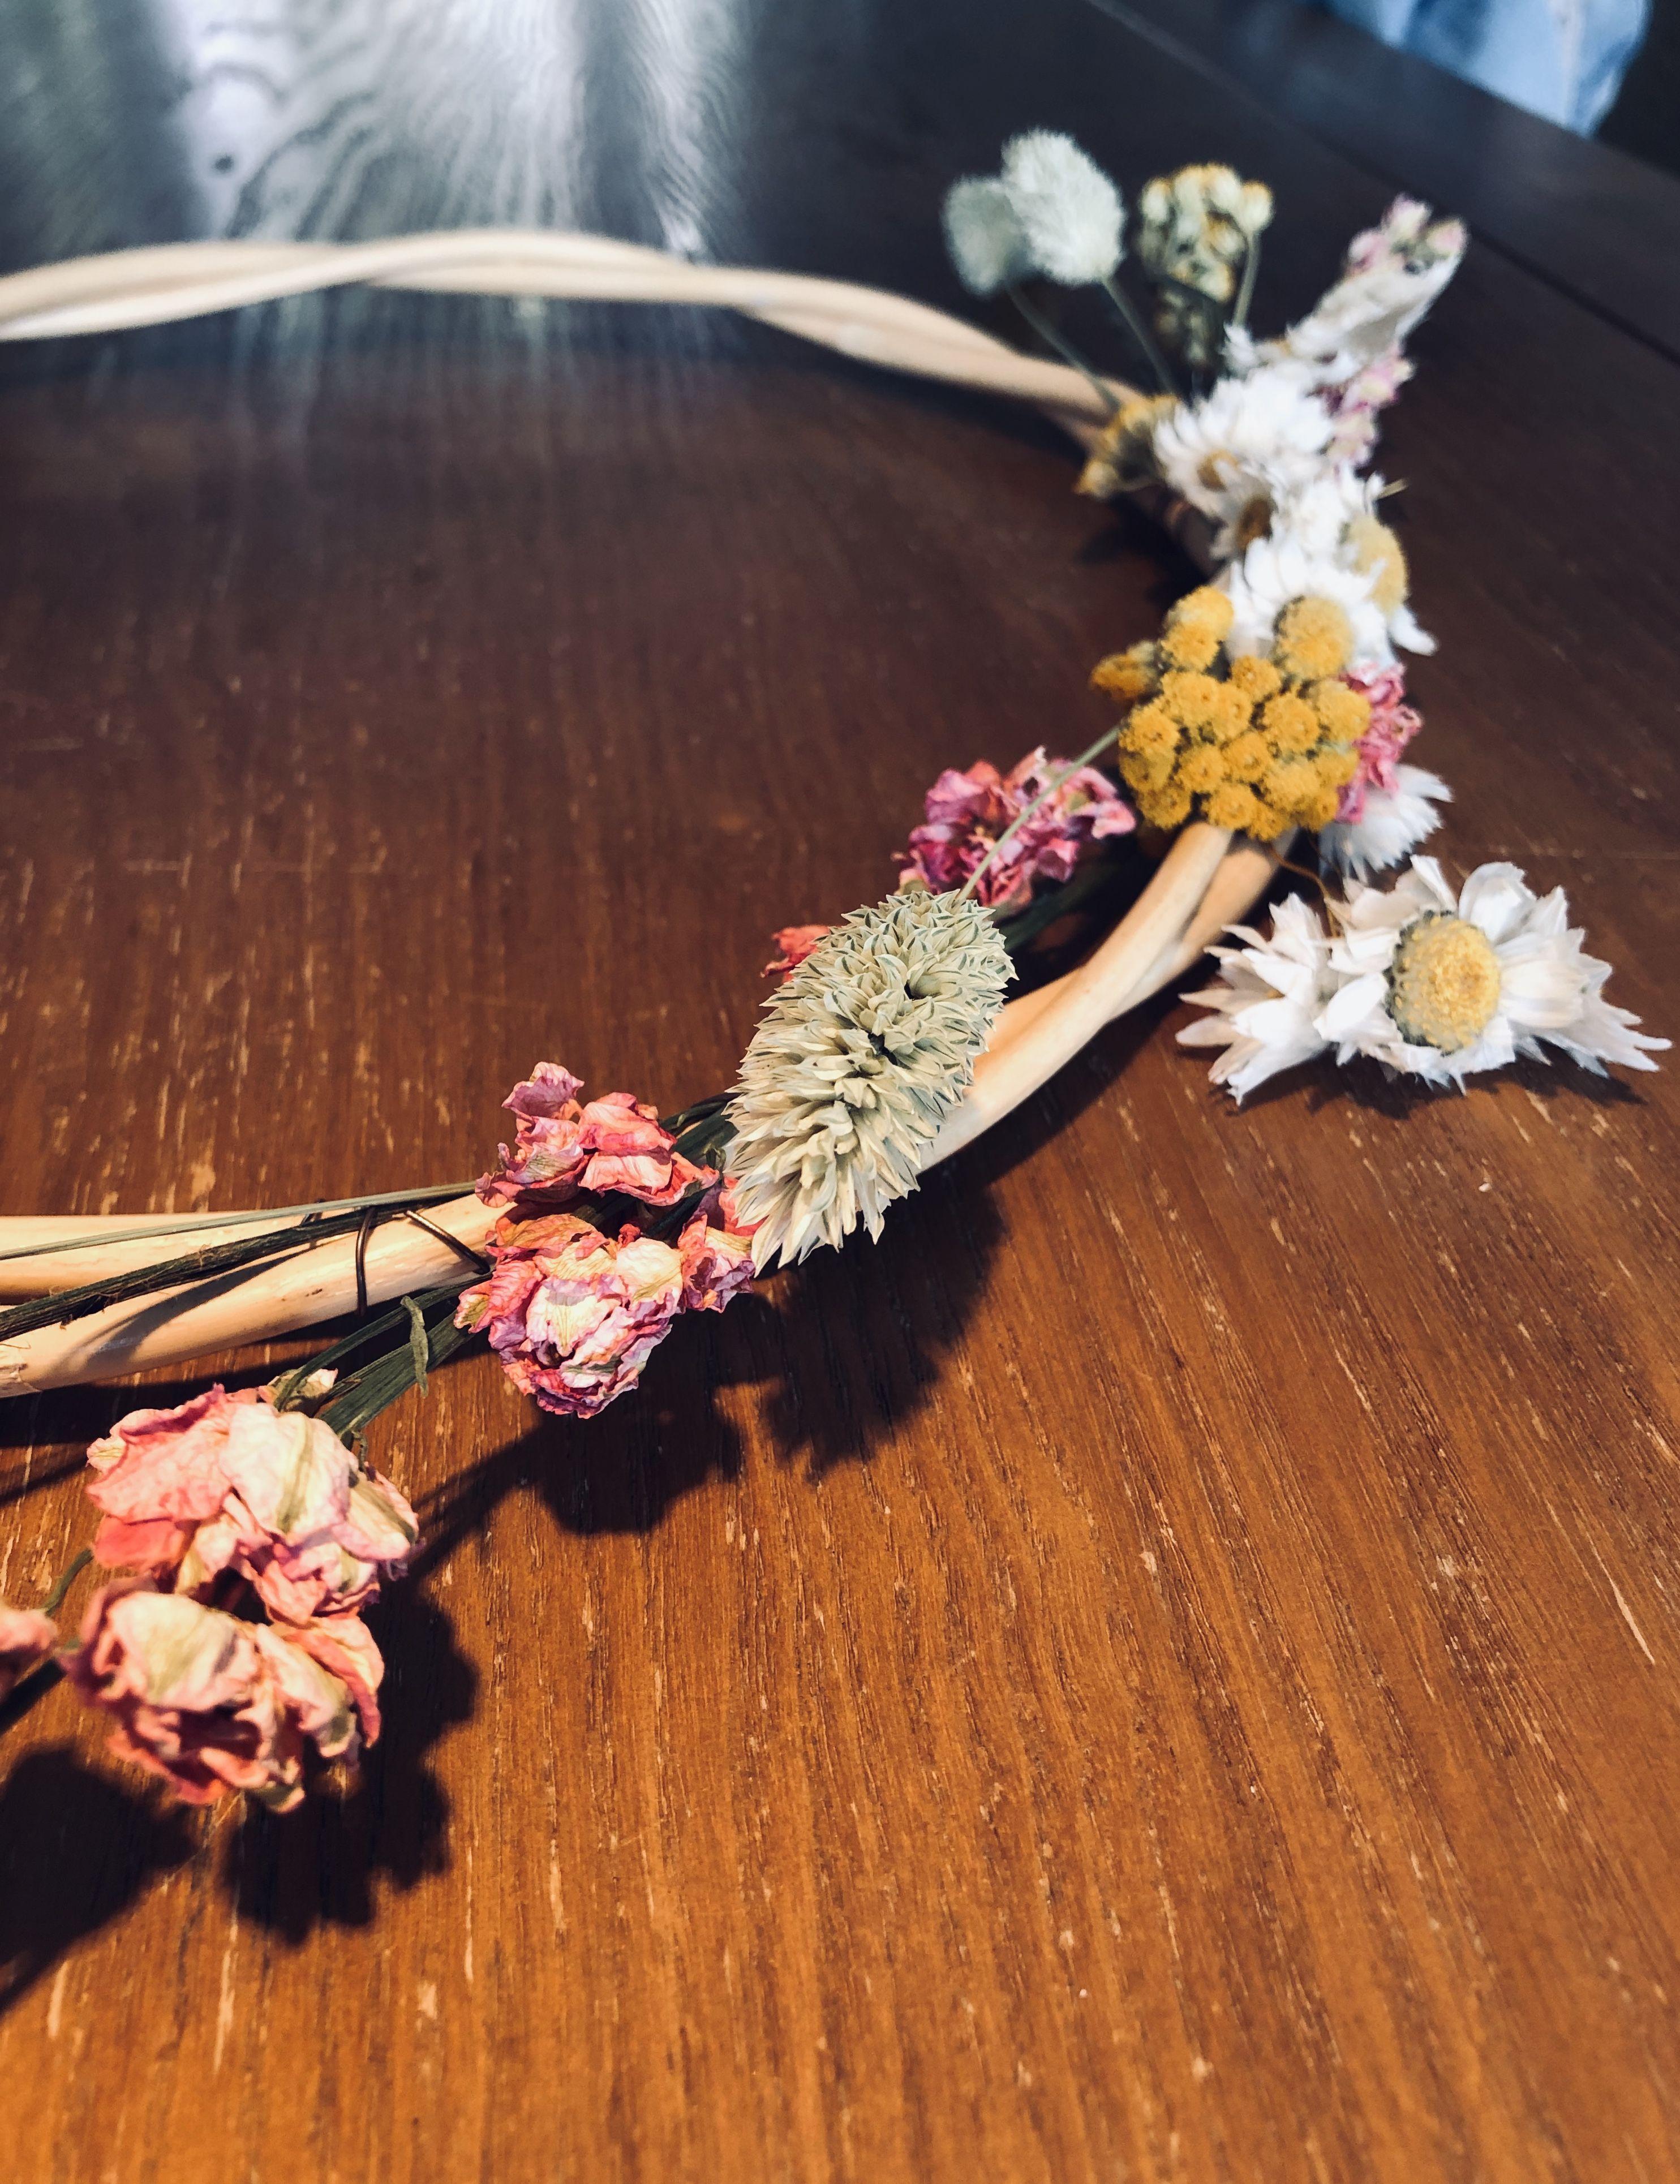 #bohemianstyle #wreath #flowers #driedflowers